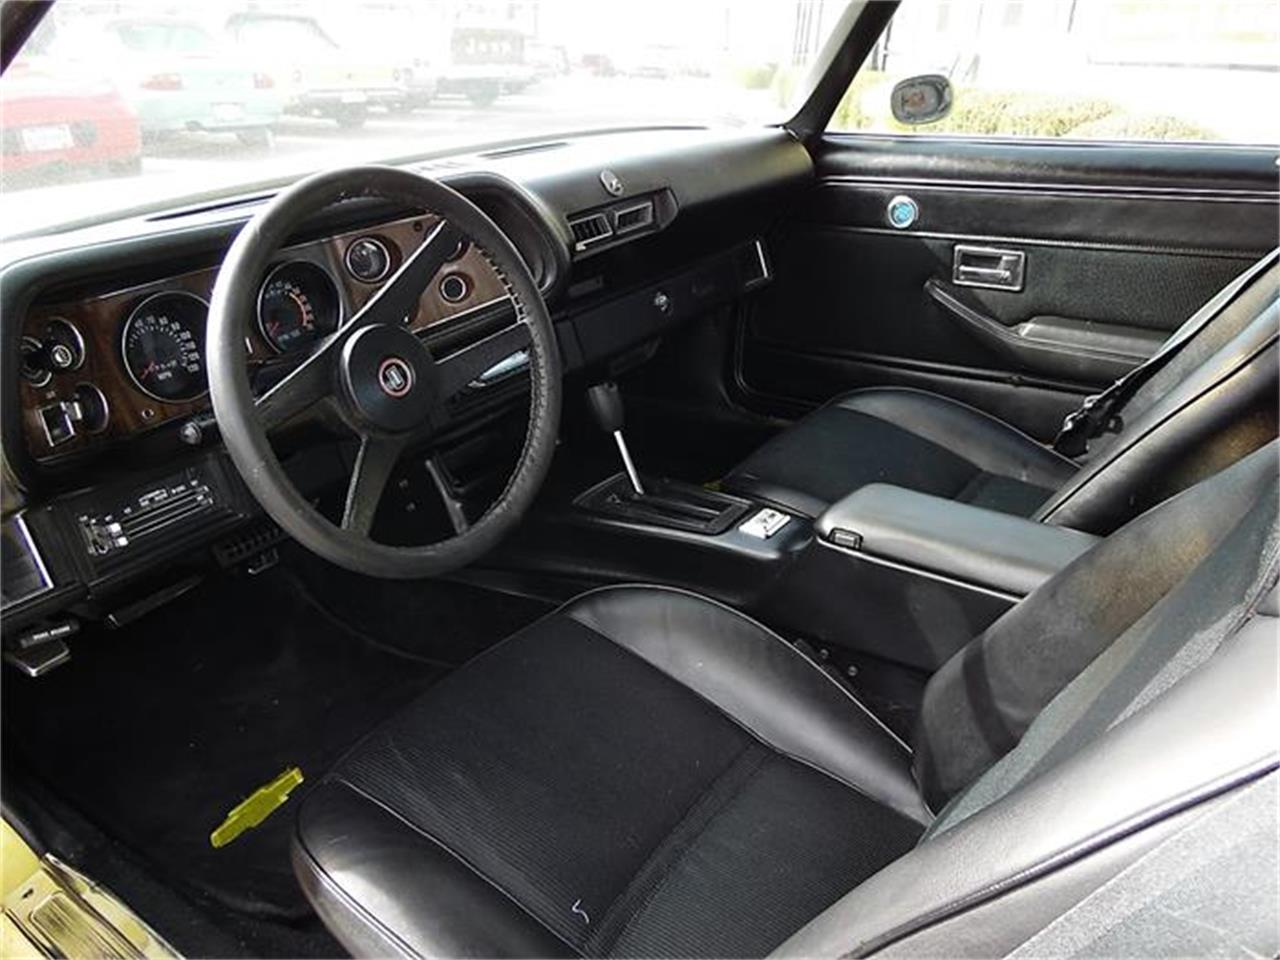 Large Picture of 1974 Camaro located in California - $9,995.00 - GP98